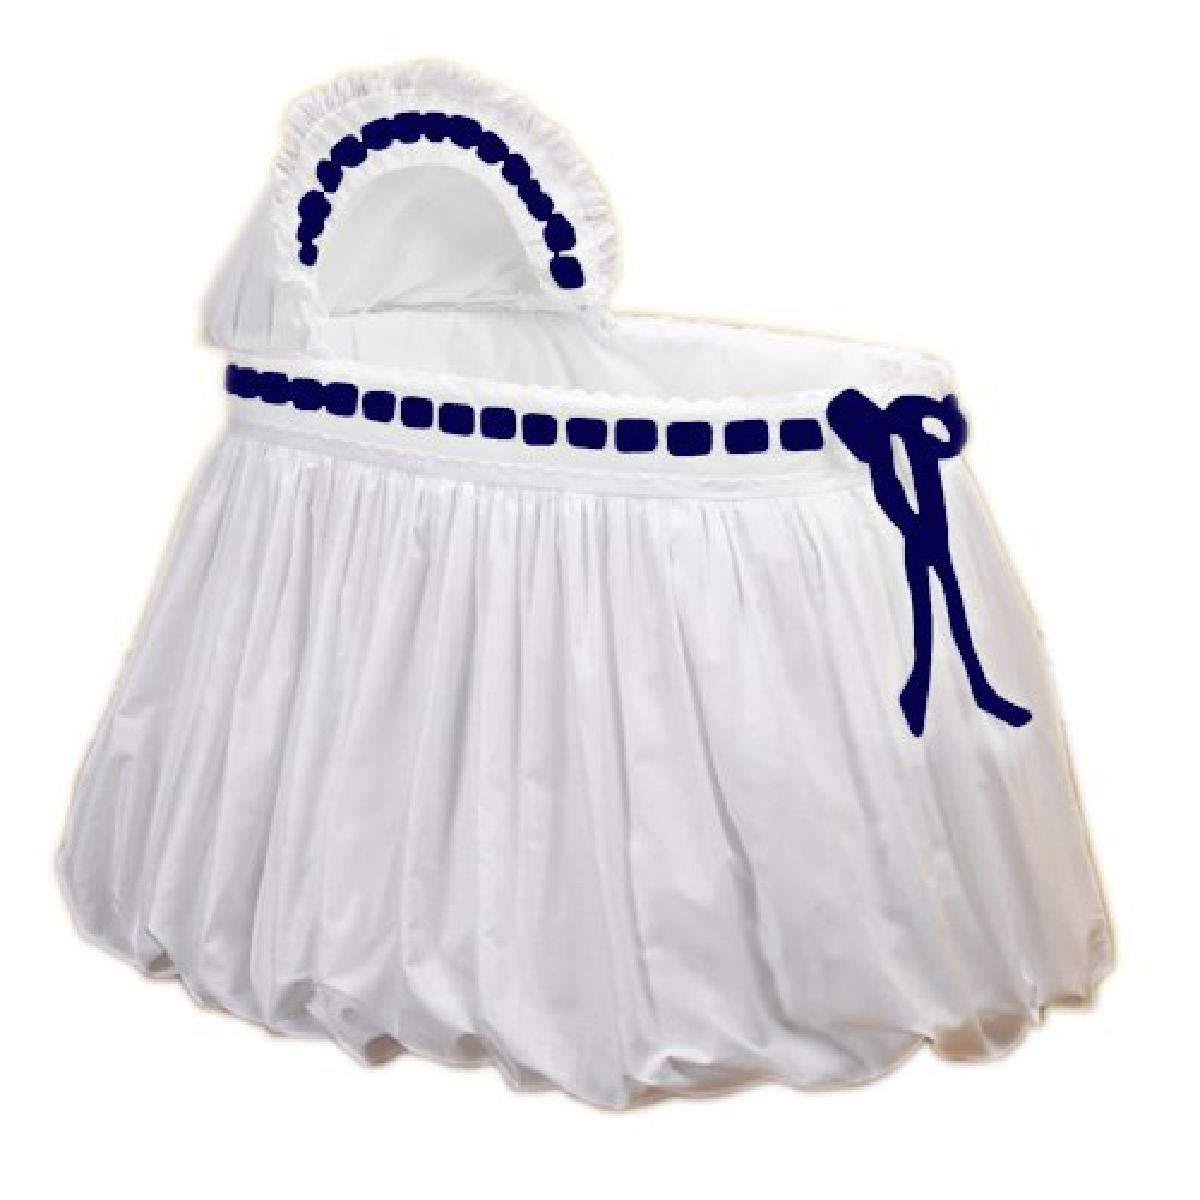 Baby Doll Bedding Pretty Ribbon Bassinet Set